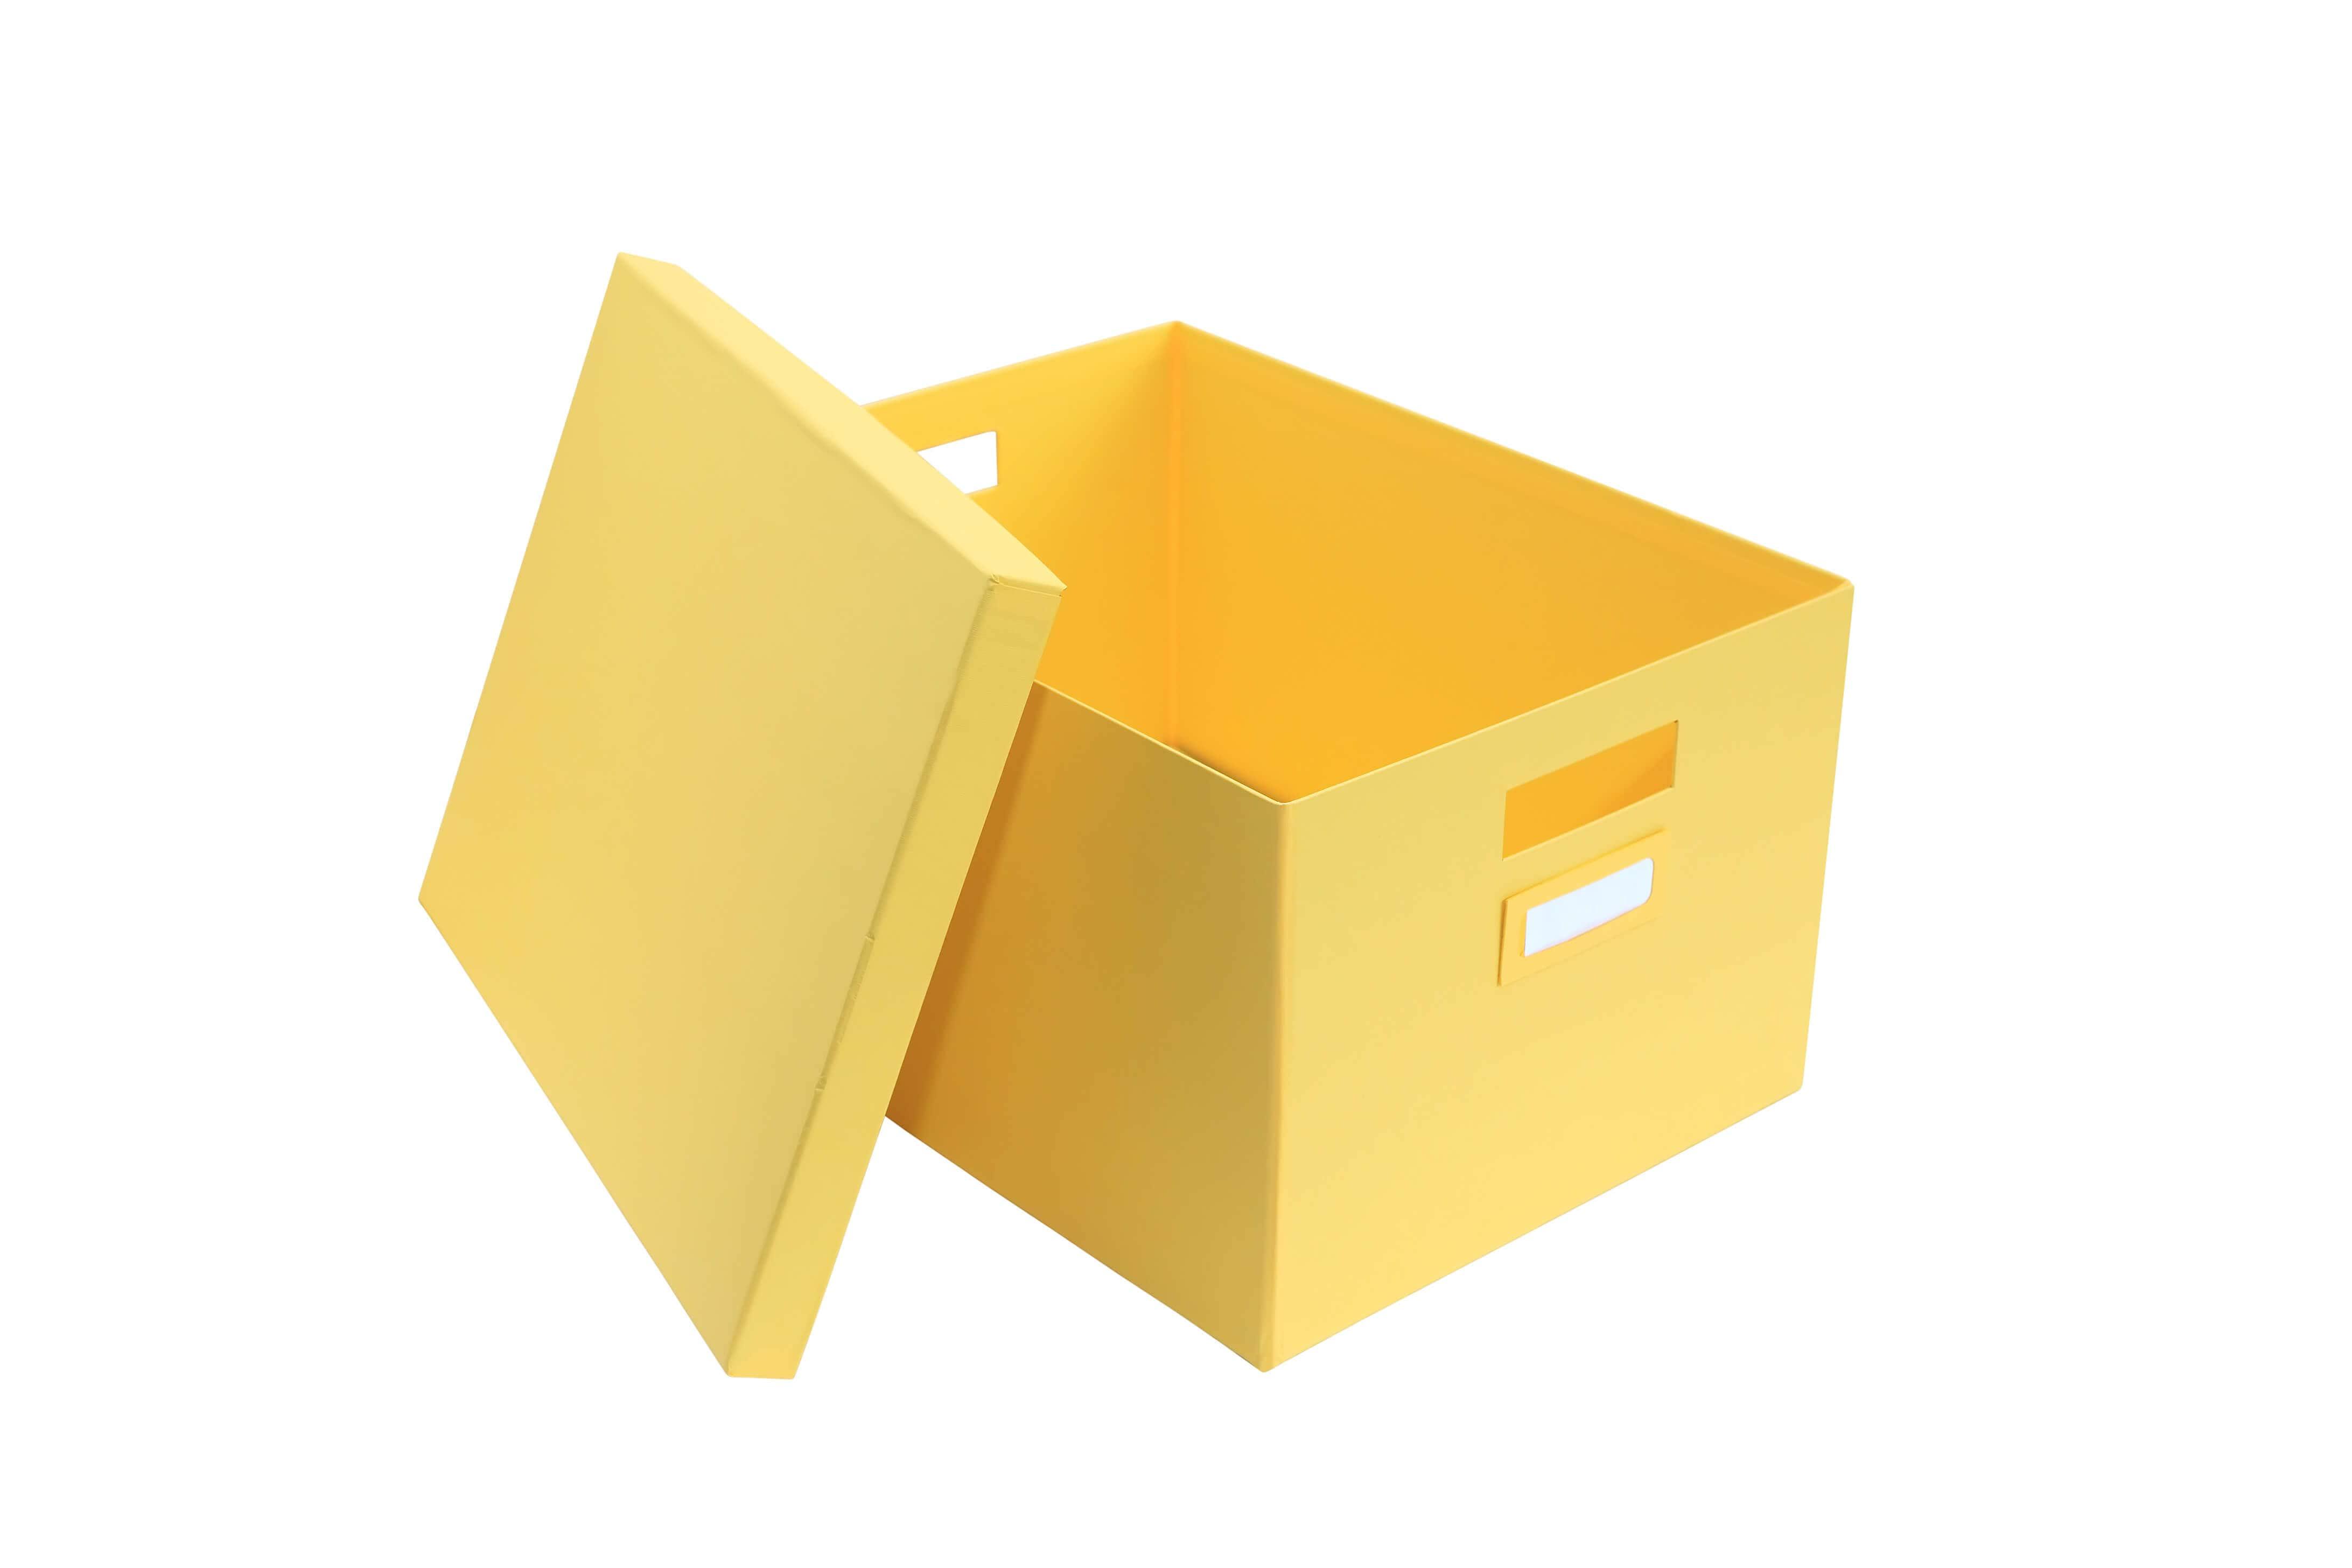 Yellow banker's cardboard box